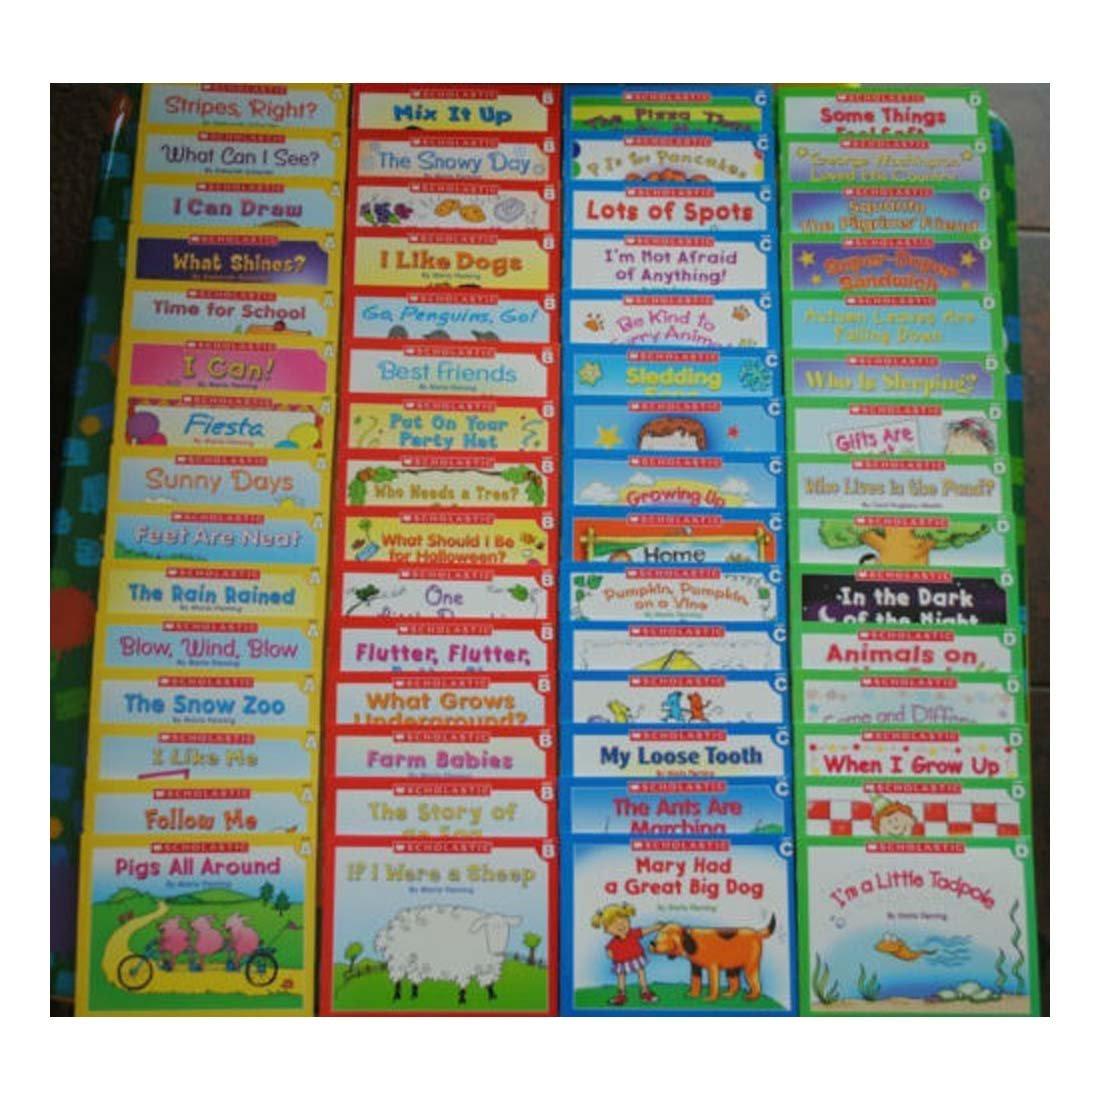 60 Easy Leveled A B C D Books Homeschool Preschool Kindergarten Learn to Read - 4 1/2'' X 5 1/2''